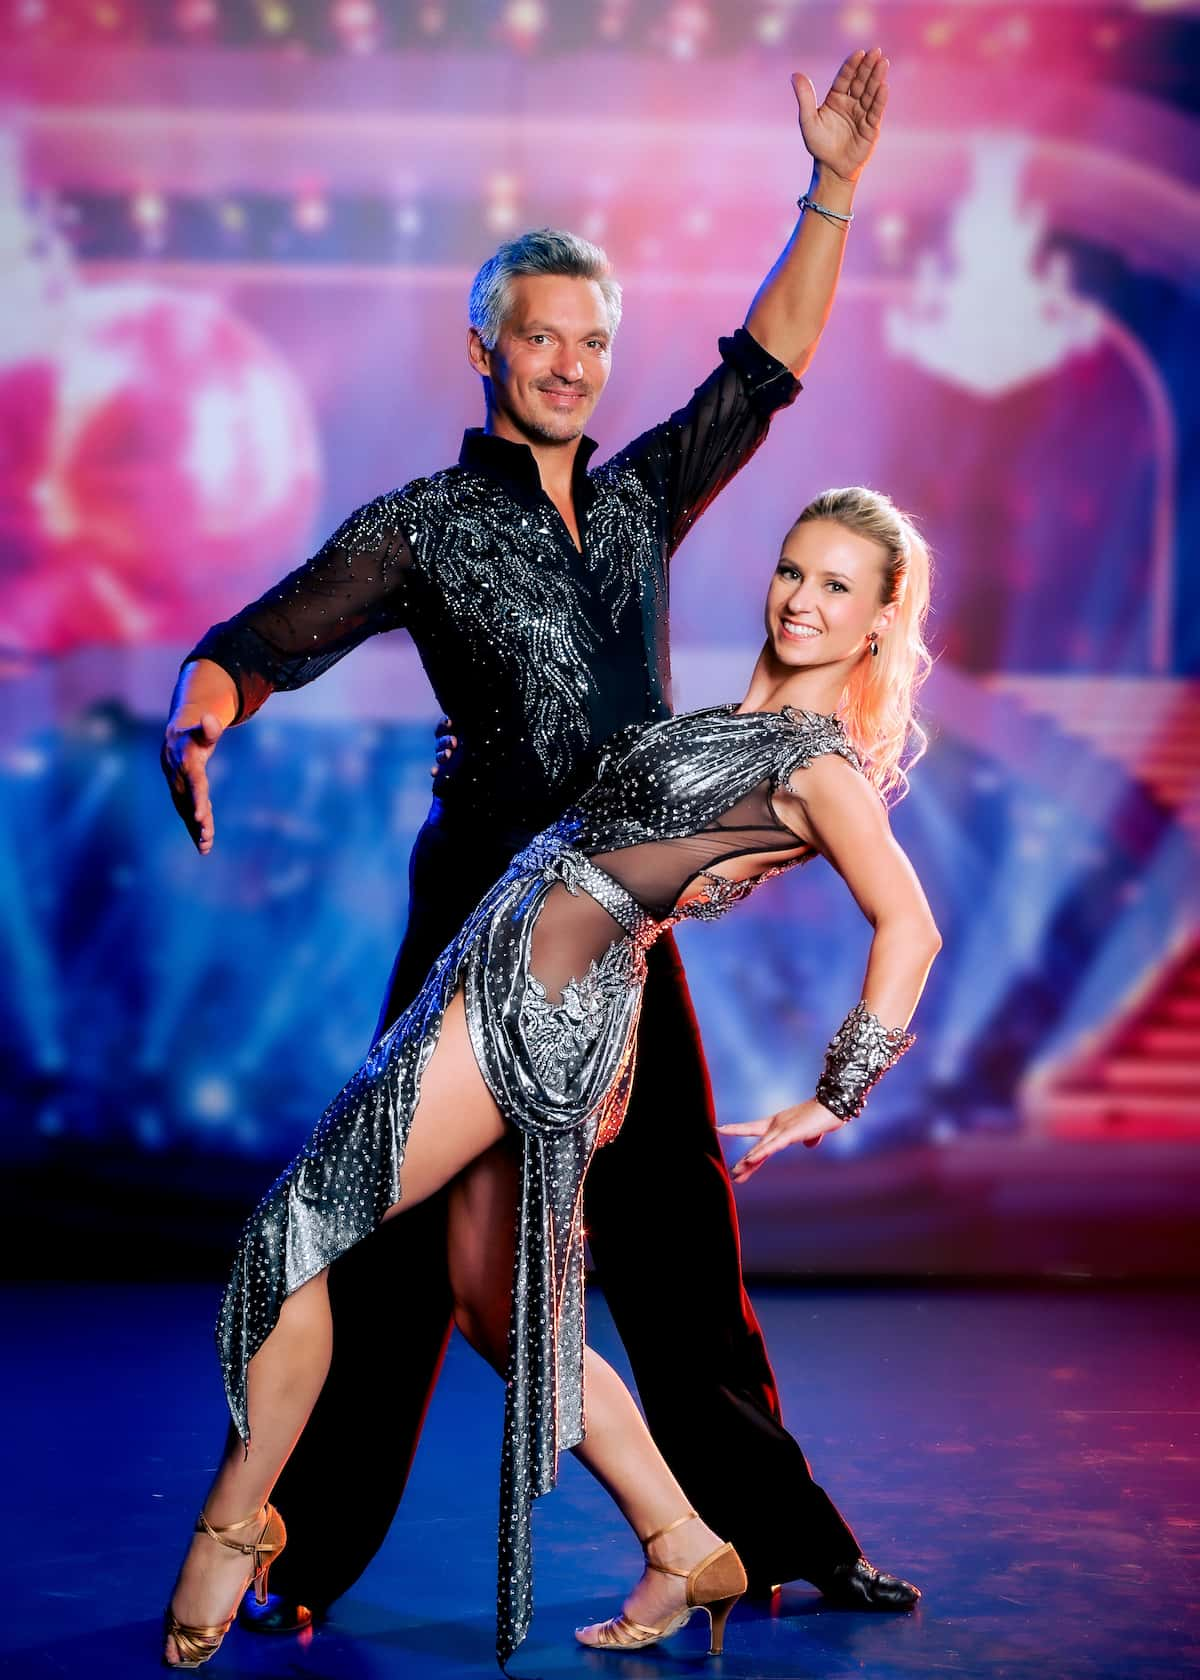 Faris Rahoma - Katrin Kati Kallus im Kleid für die Dancing Stars am 24.9.2021